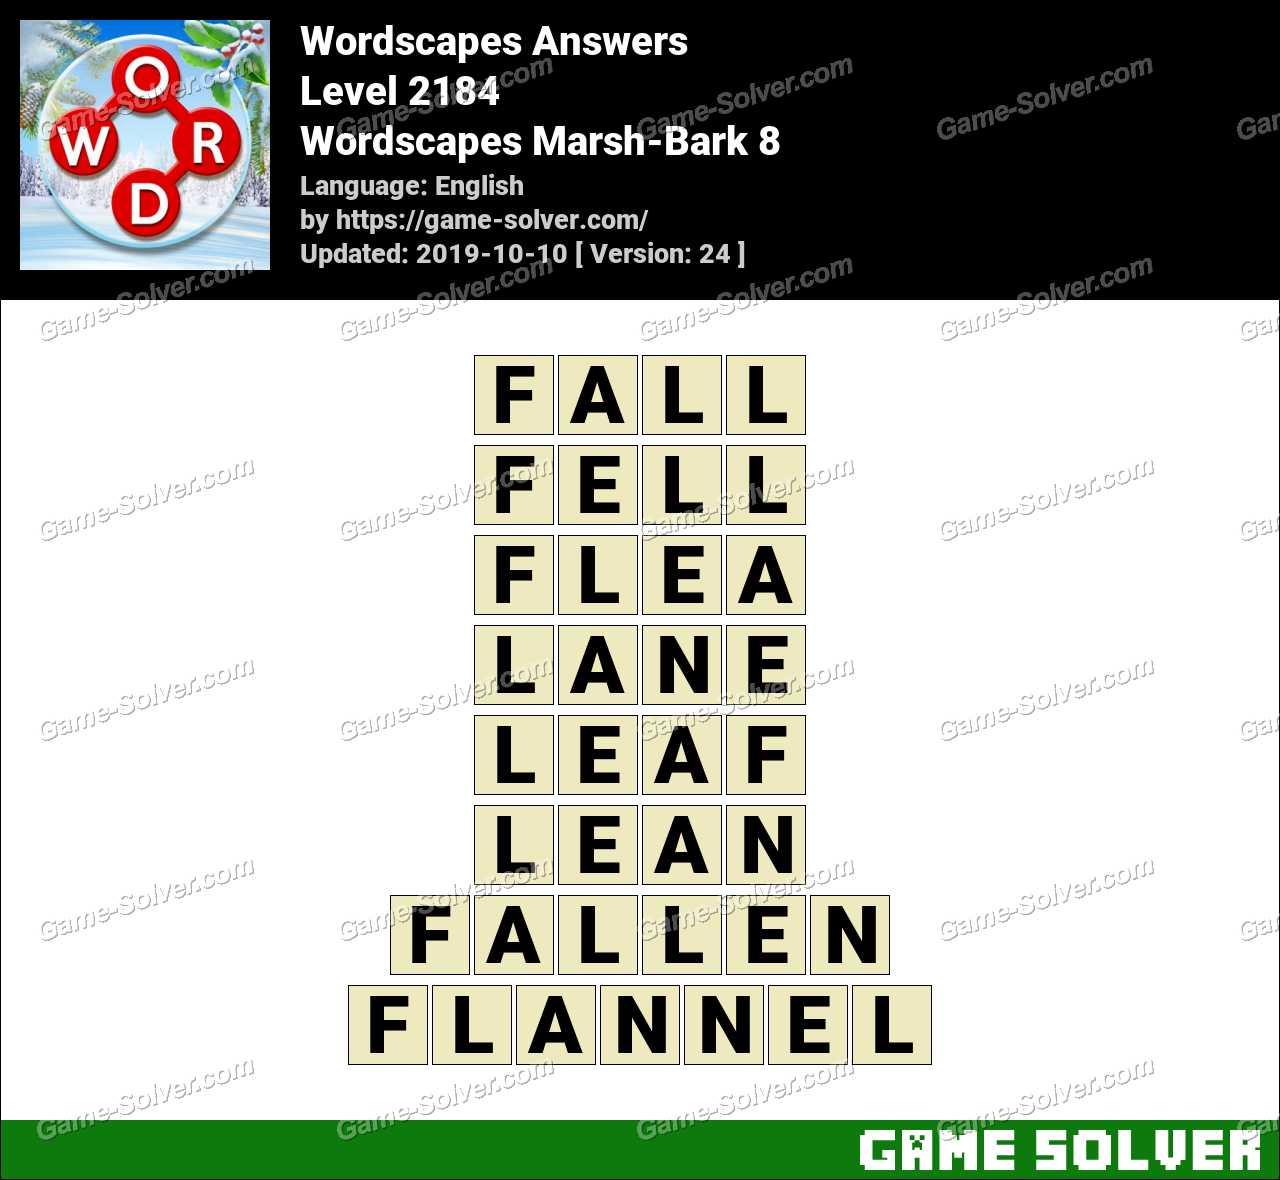 Wordscapes Marsh-Bark 8 Answers